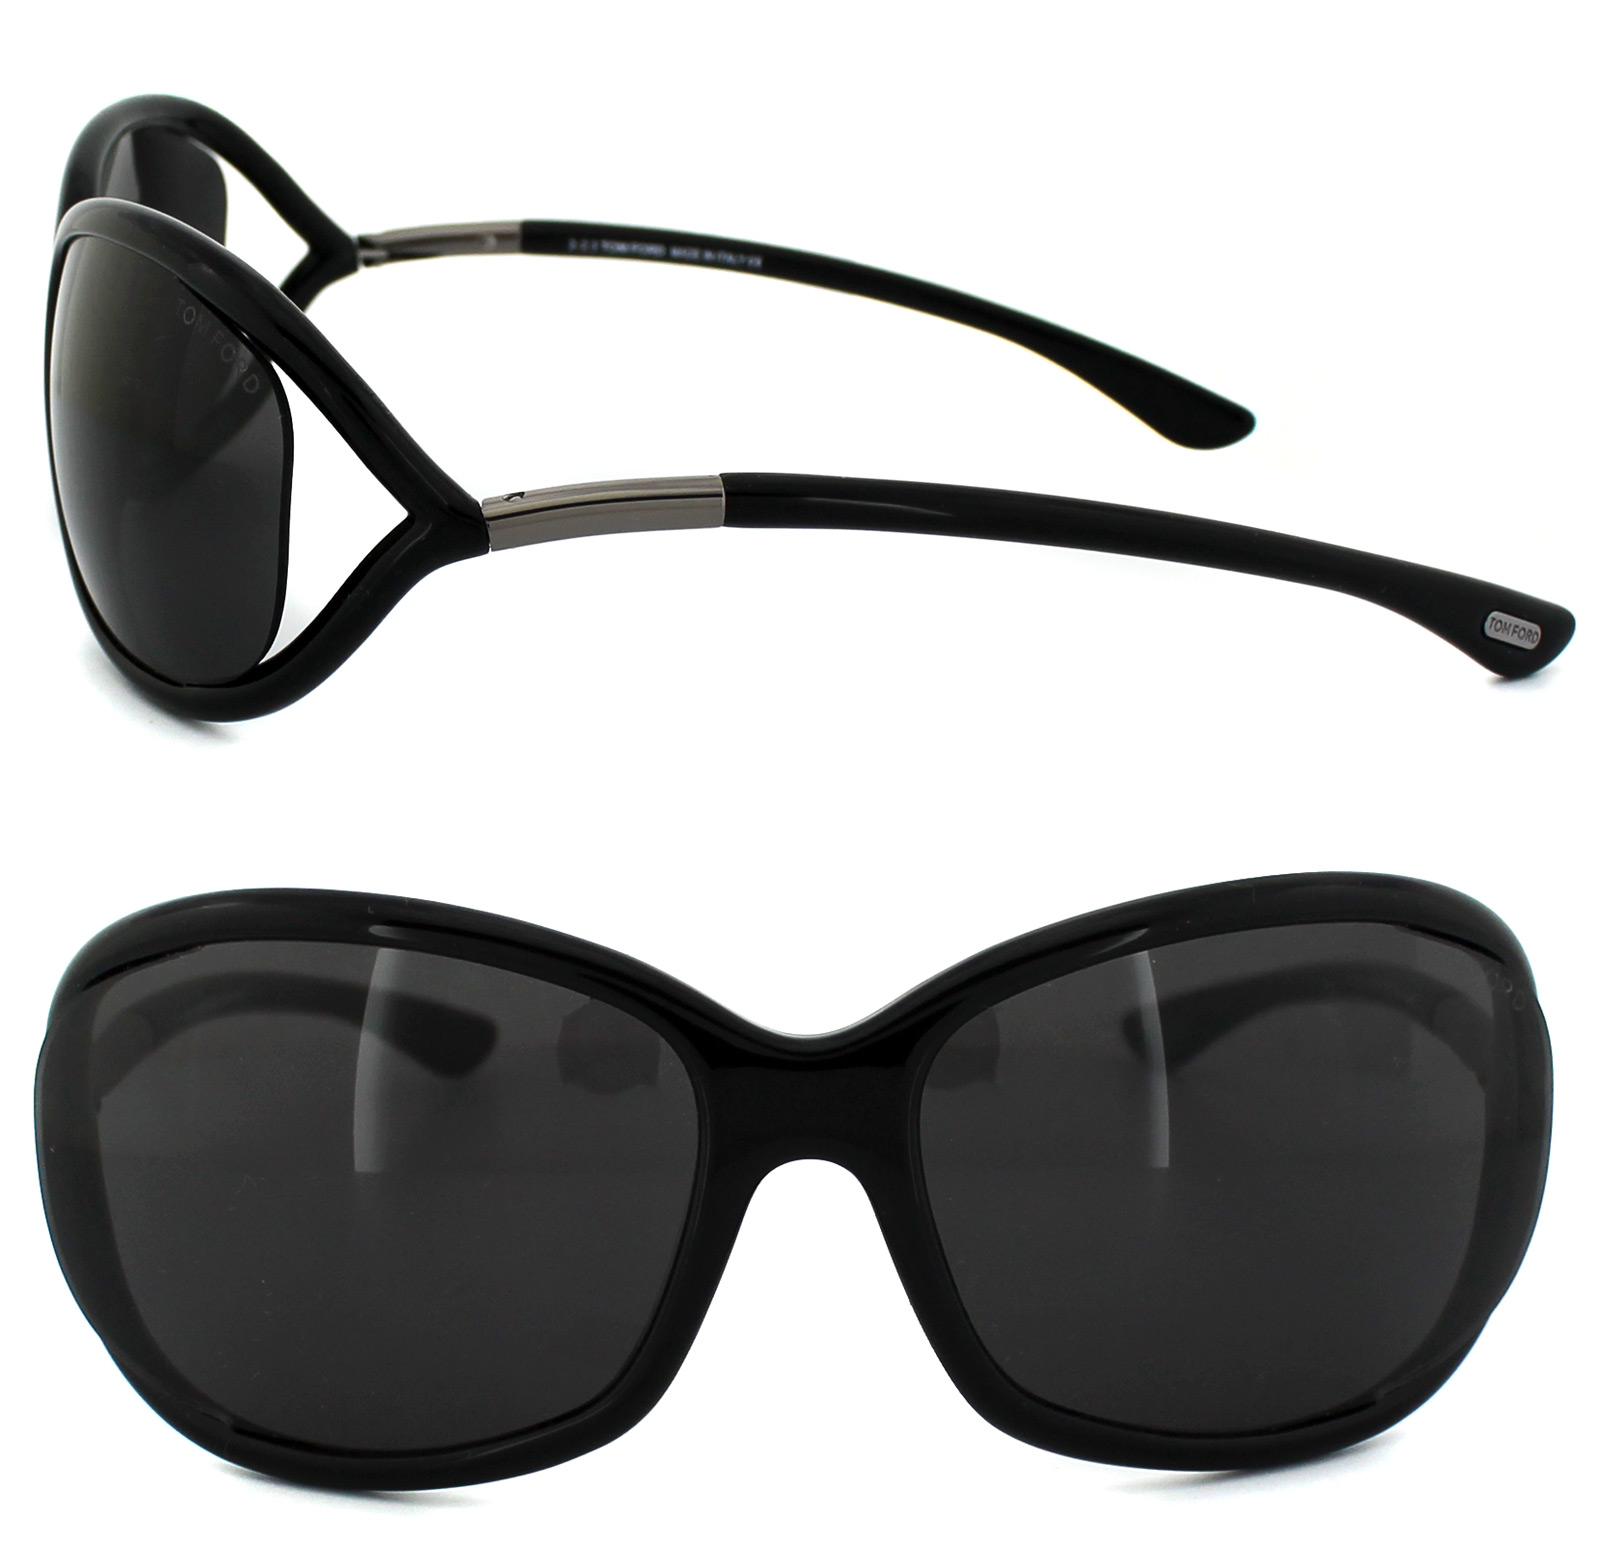 0efdae5b1f22 Cheap Tom Ford 0008 Jennifer Sunglasses - Discounted Sunglasses